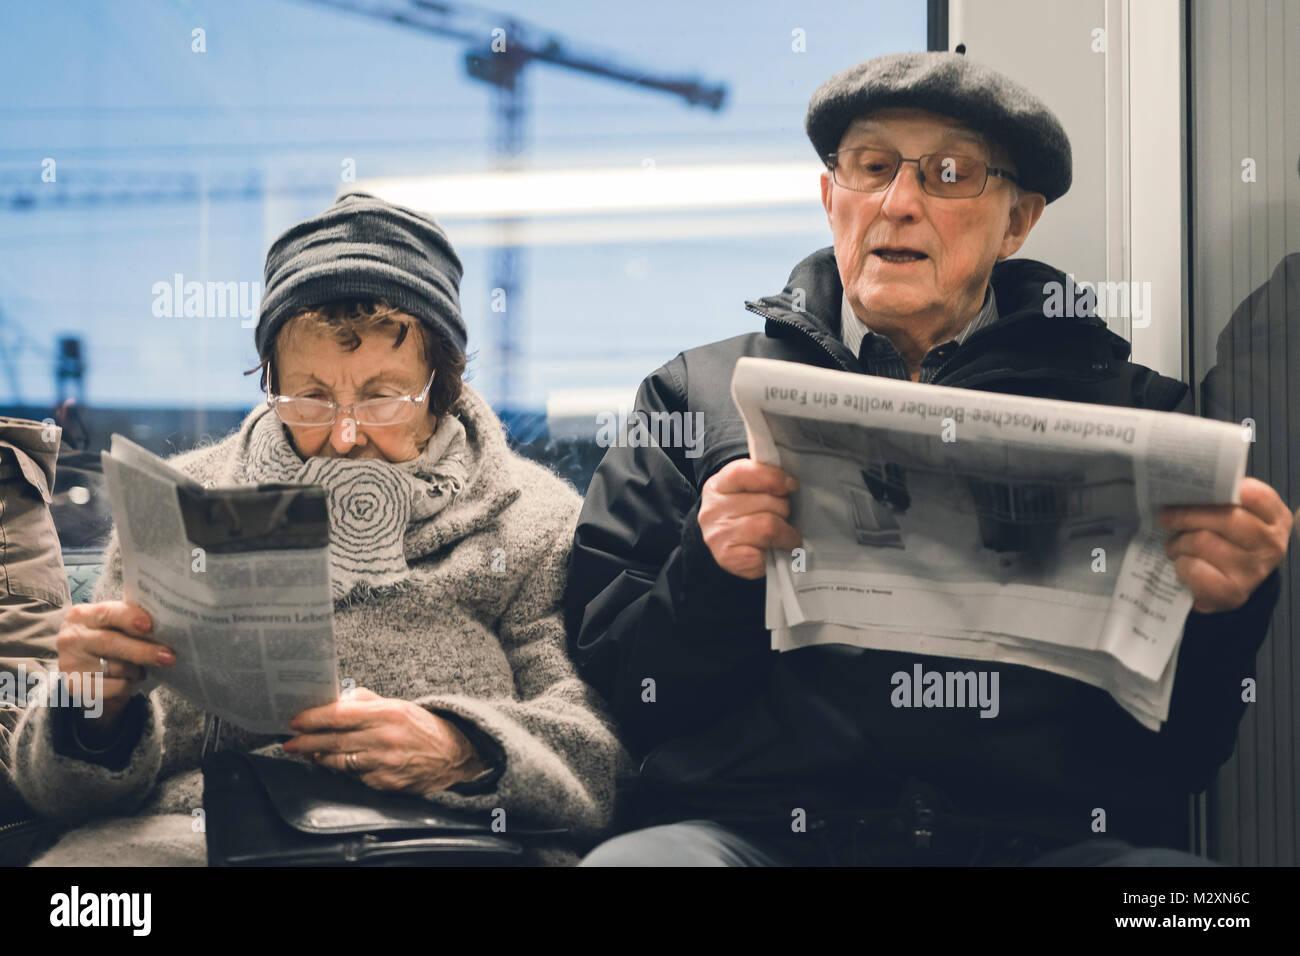 Ältere Paare Zeitung lesen, mit der S-Bahn, Berlin. Stockbild